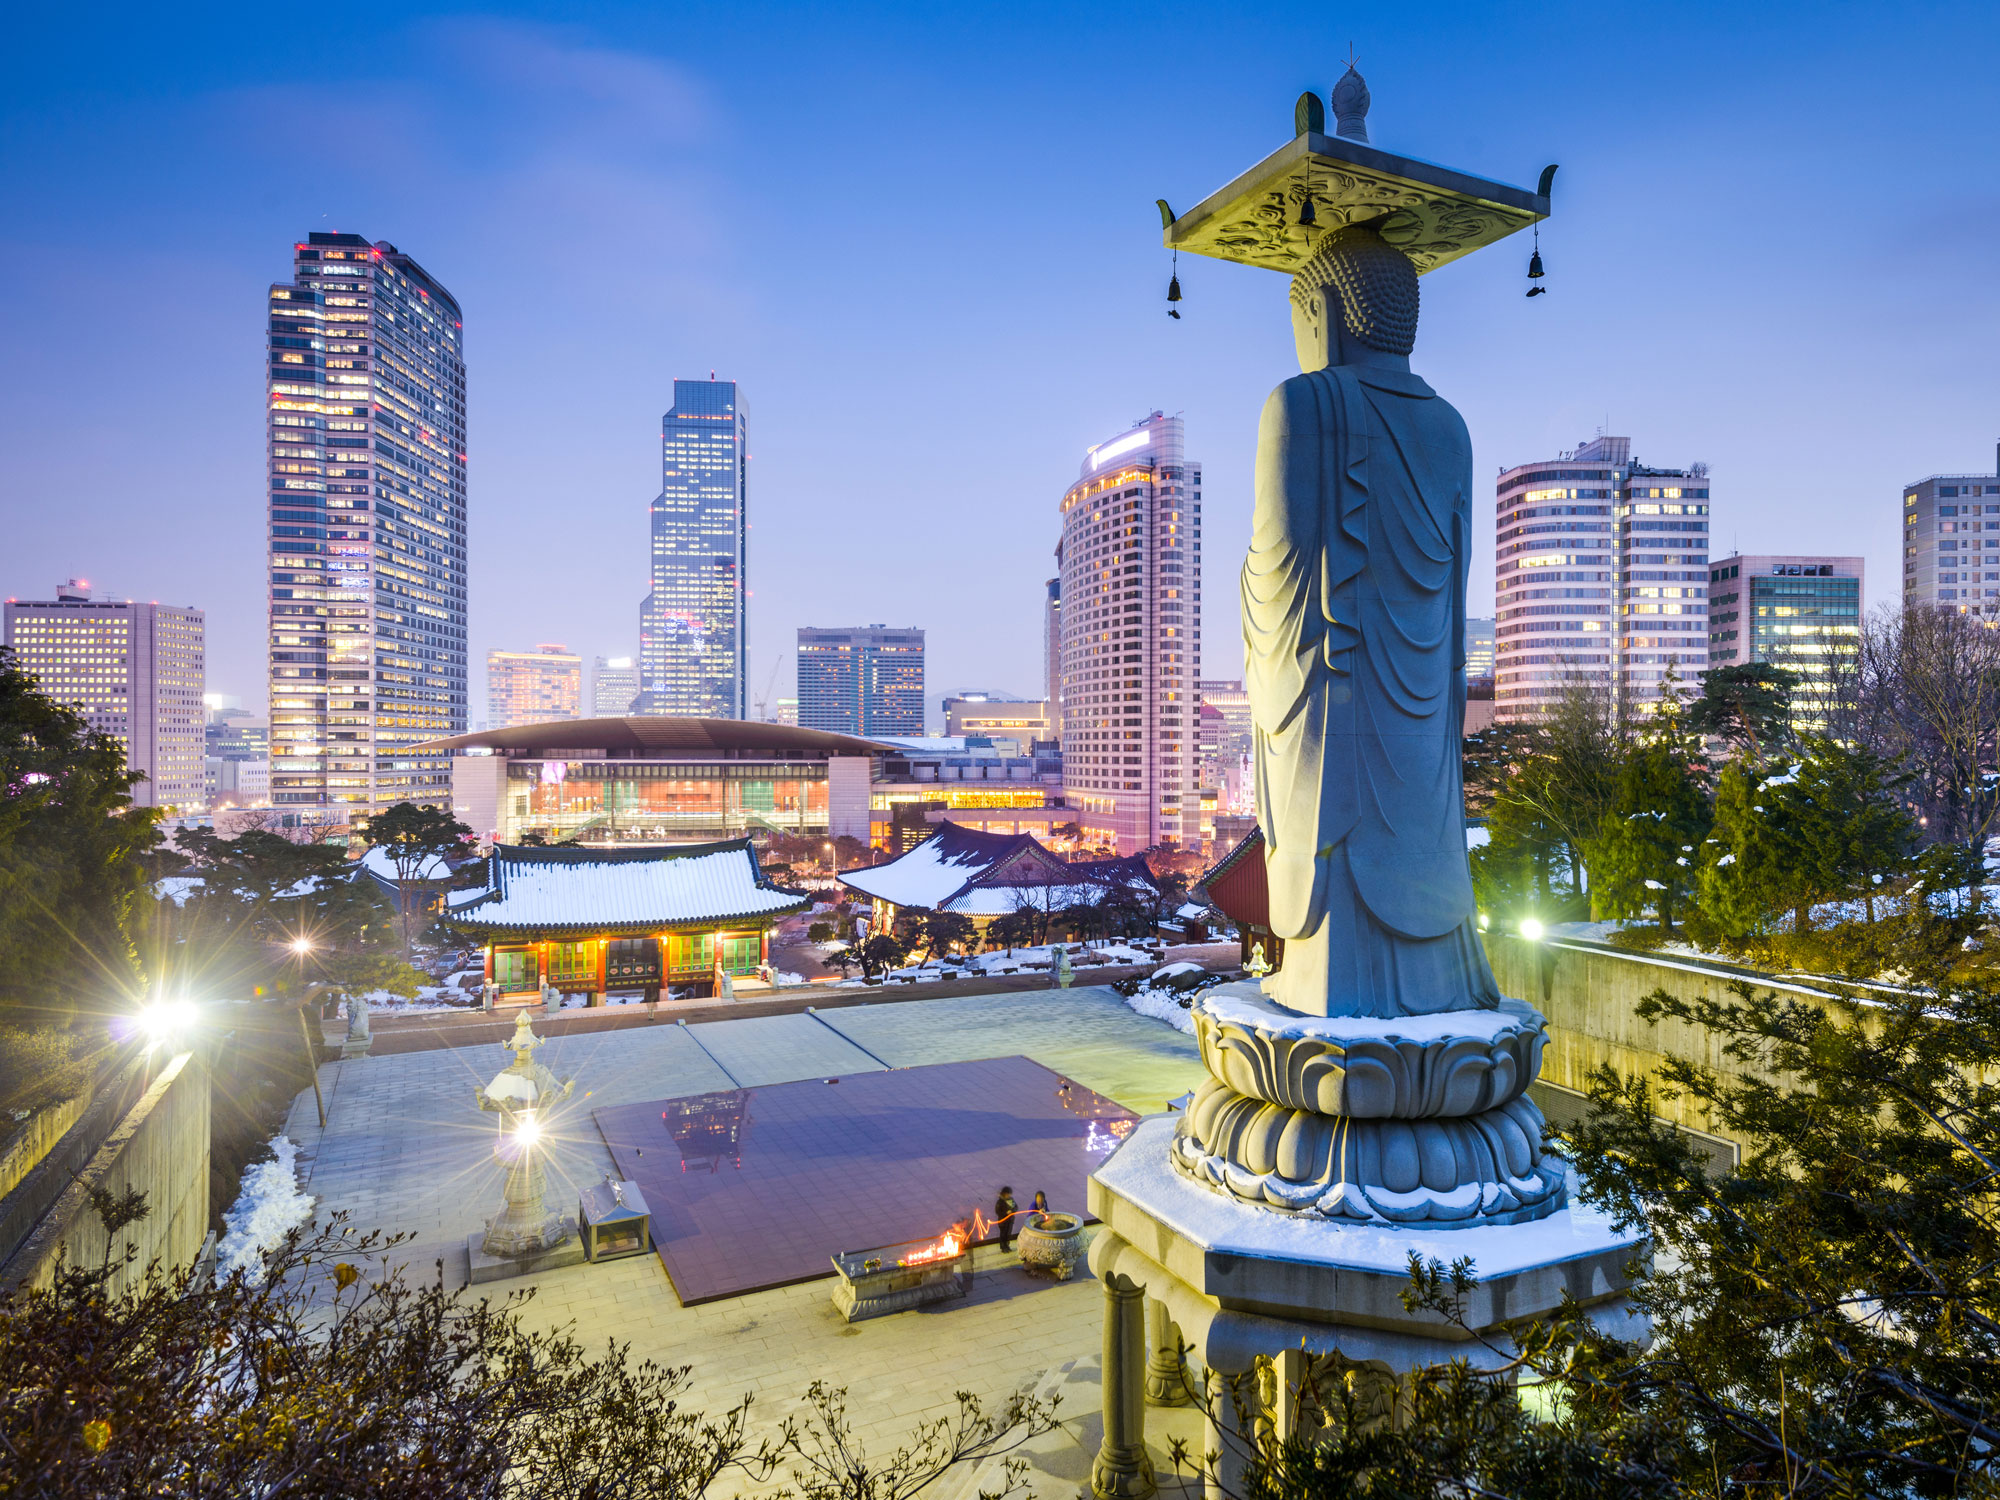 Night cityscape view of Gangnam Seoul, South Korea